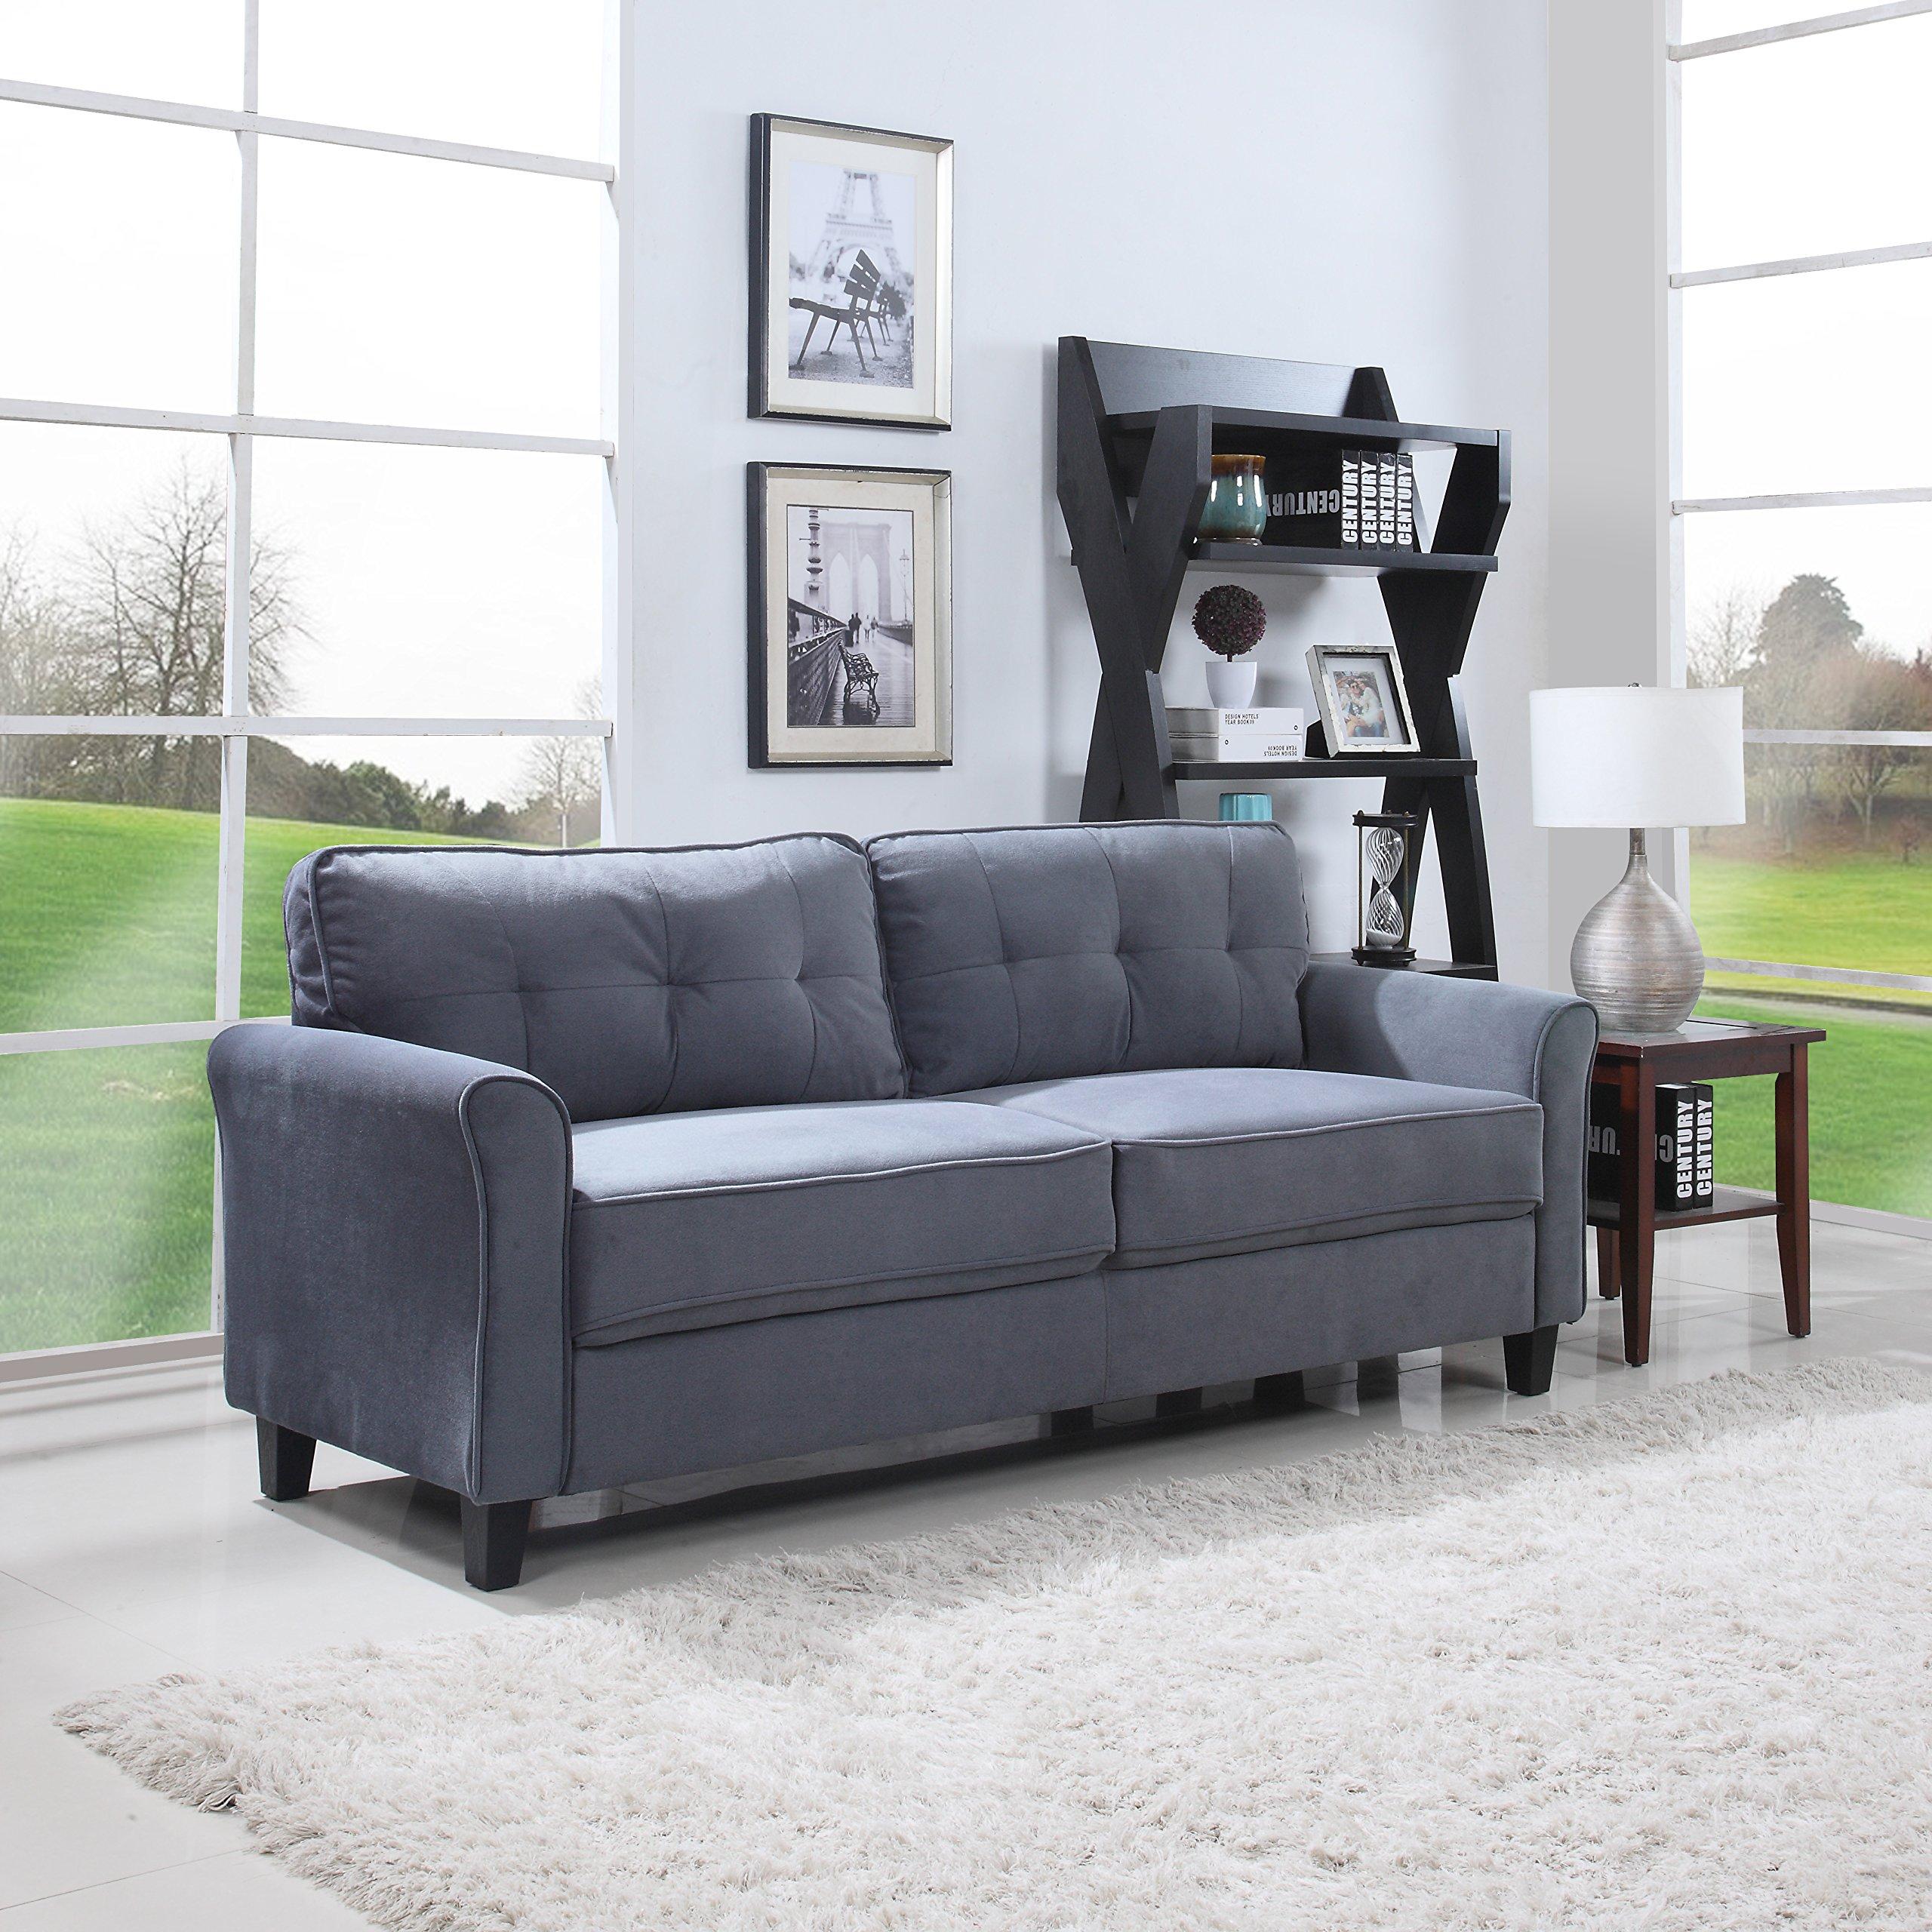 Classic Ultra Comfortable Brush Microfiber Fabric Living Room Sofa (Dark  Grey) | LAVORIST